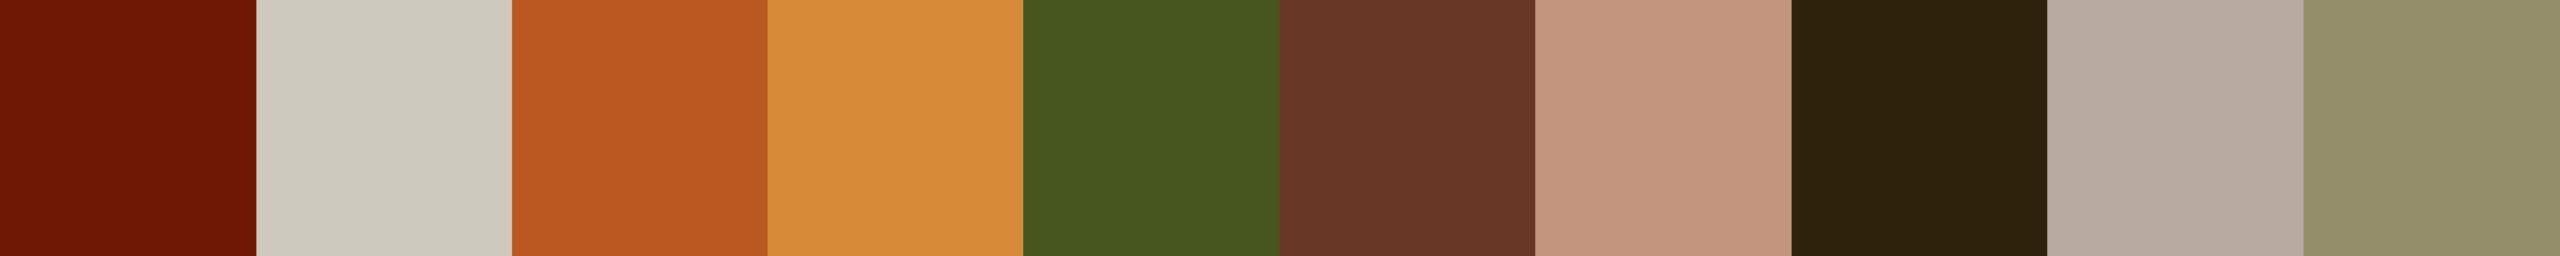 280 Wogenfalia Color Palette